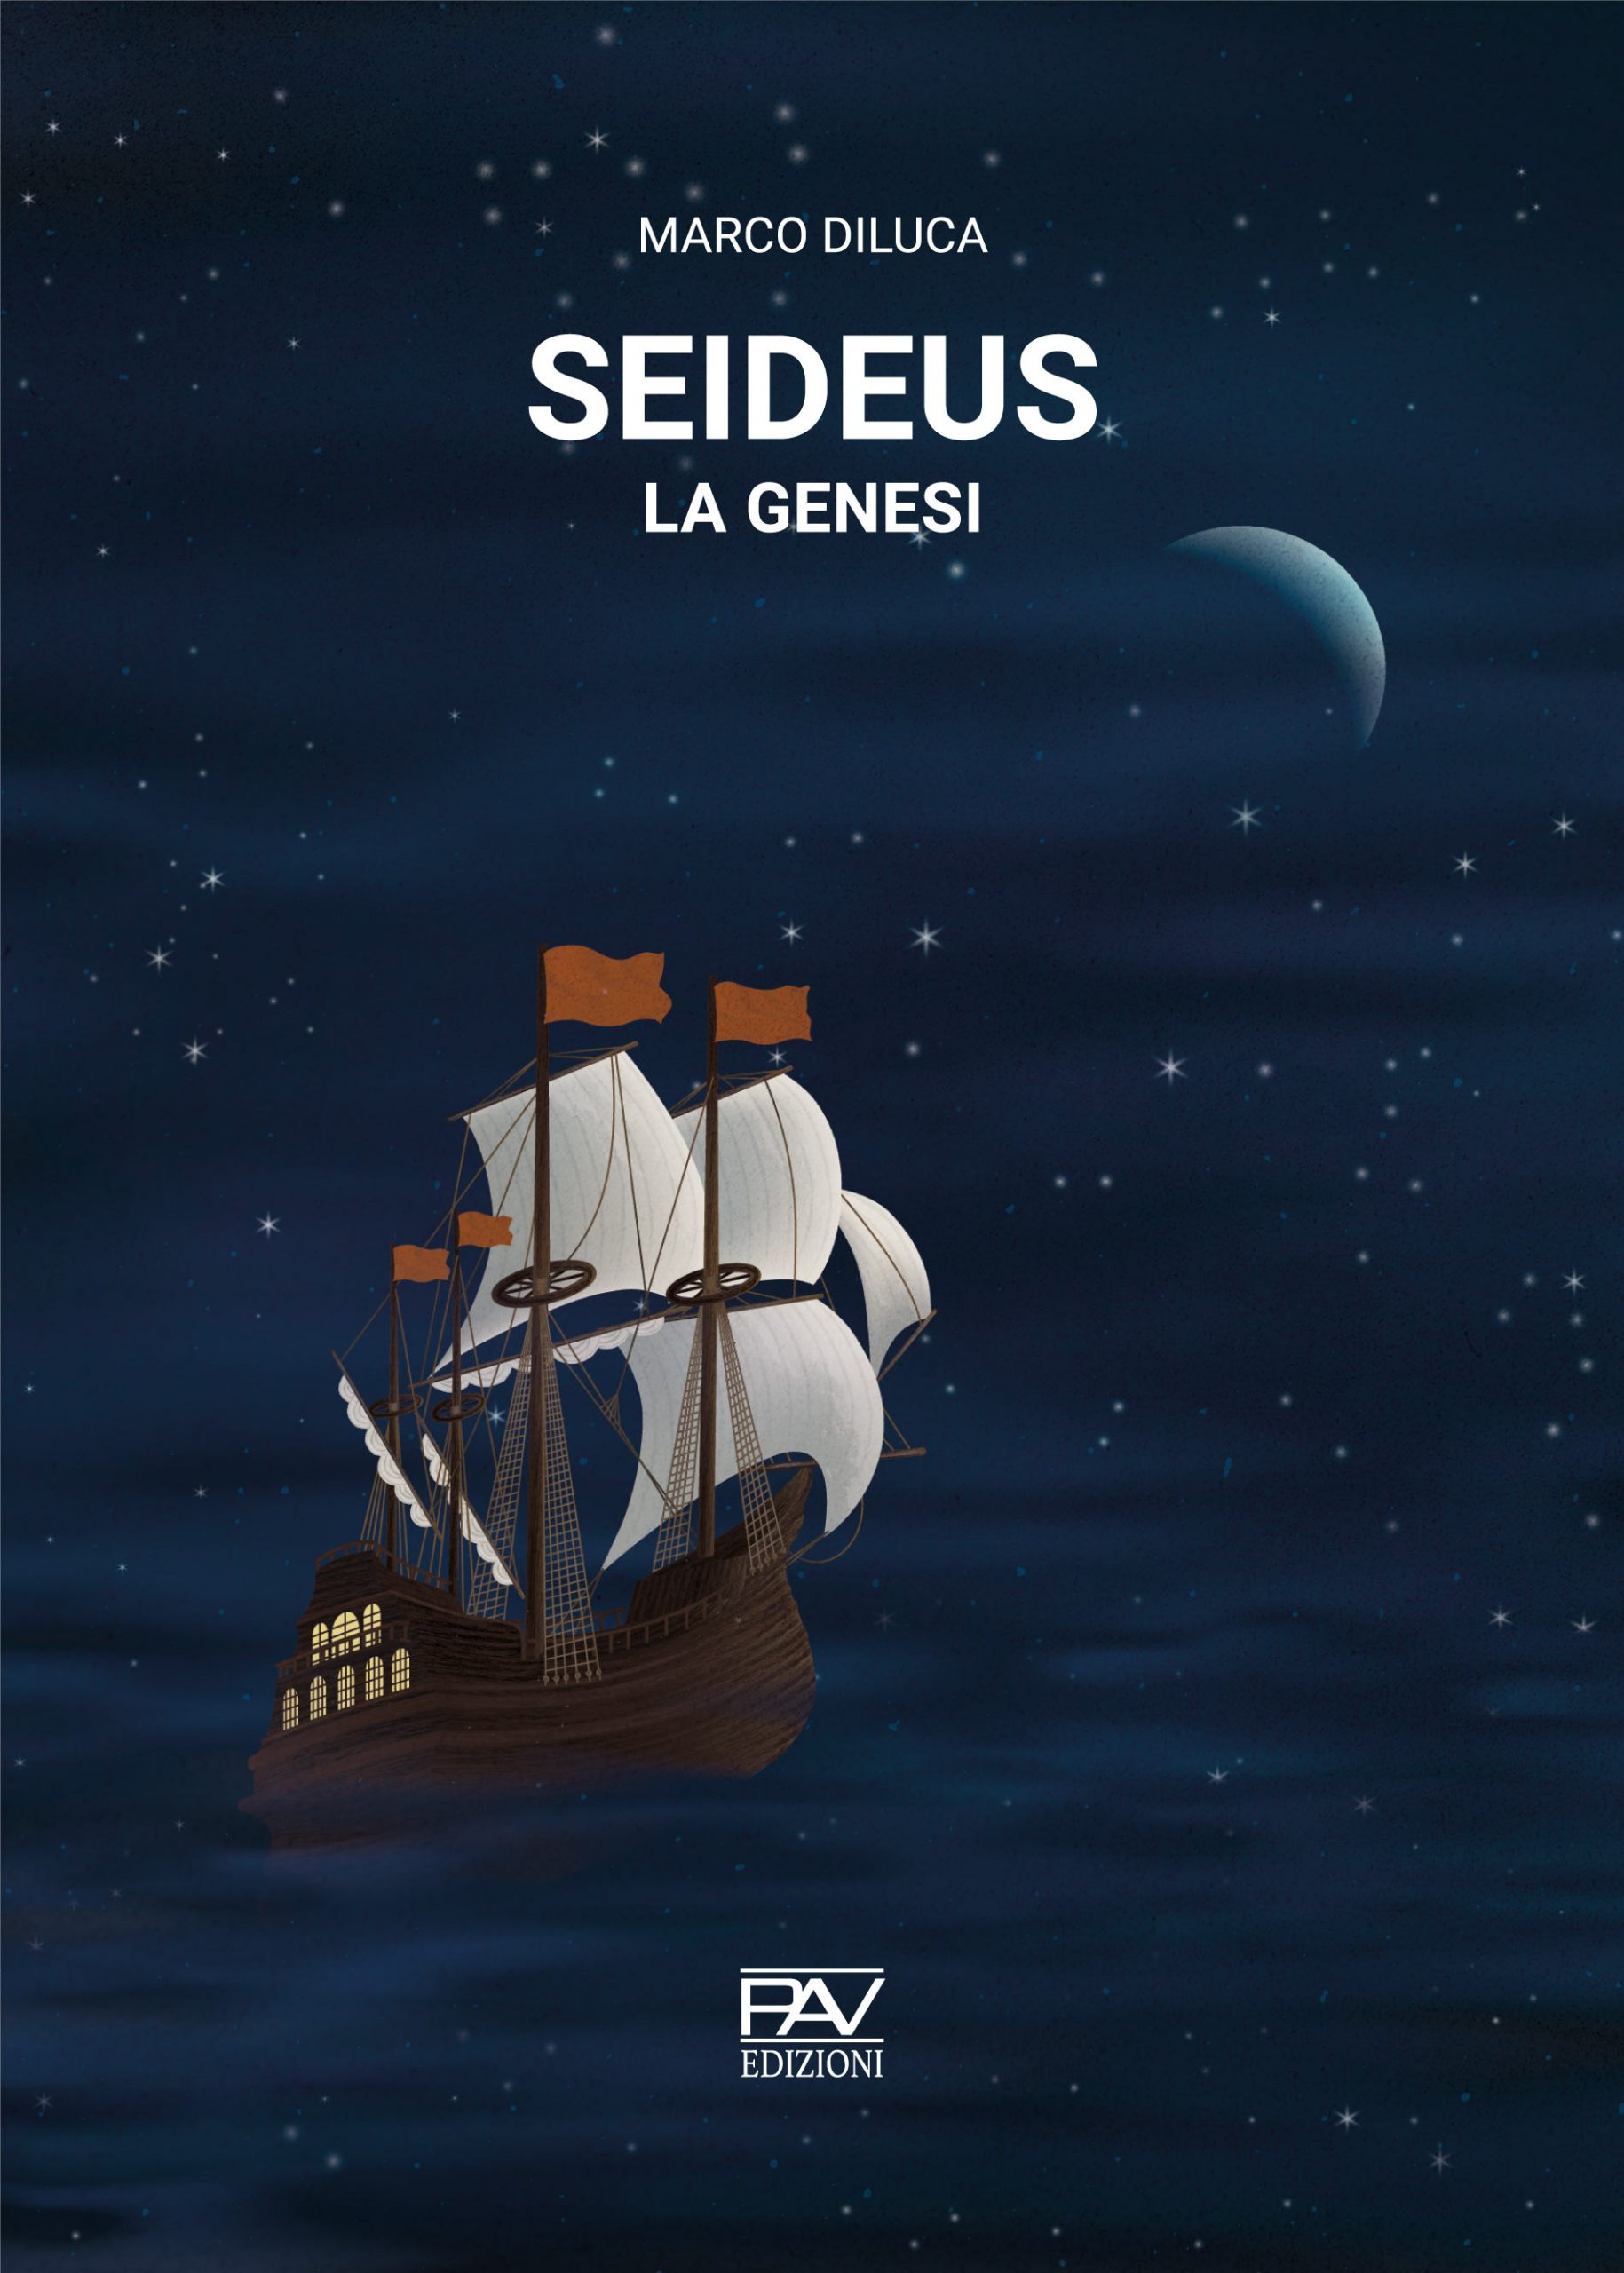 Seideus- La genesi di Marco Di Luca